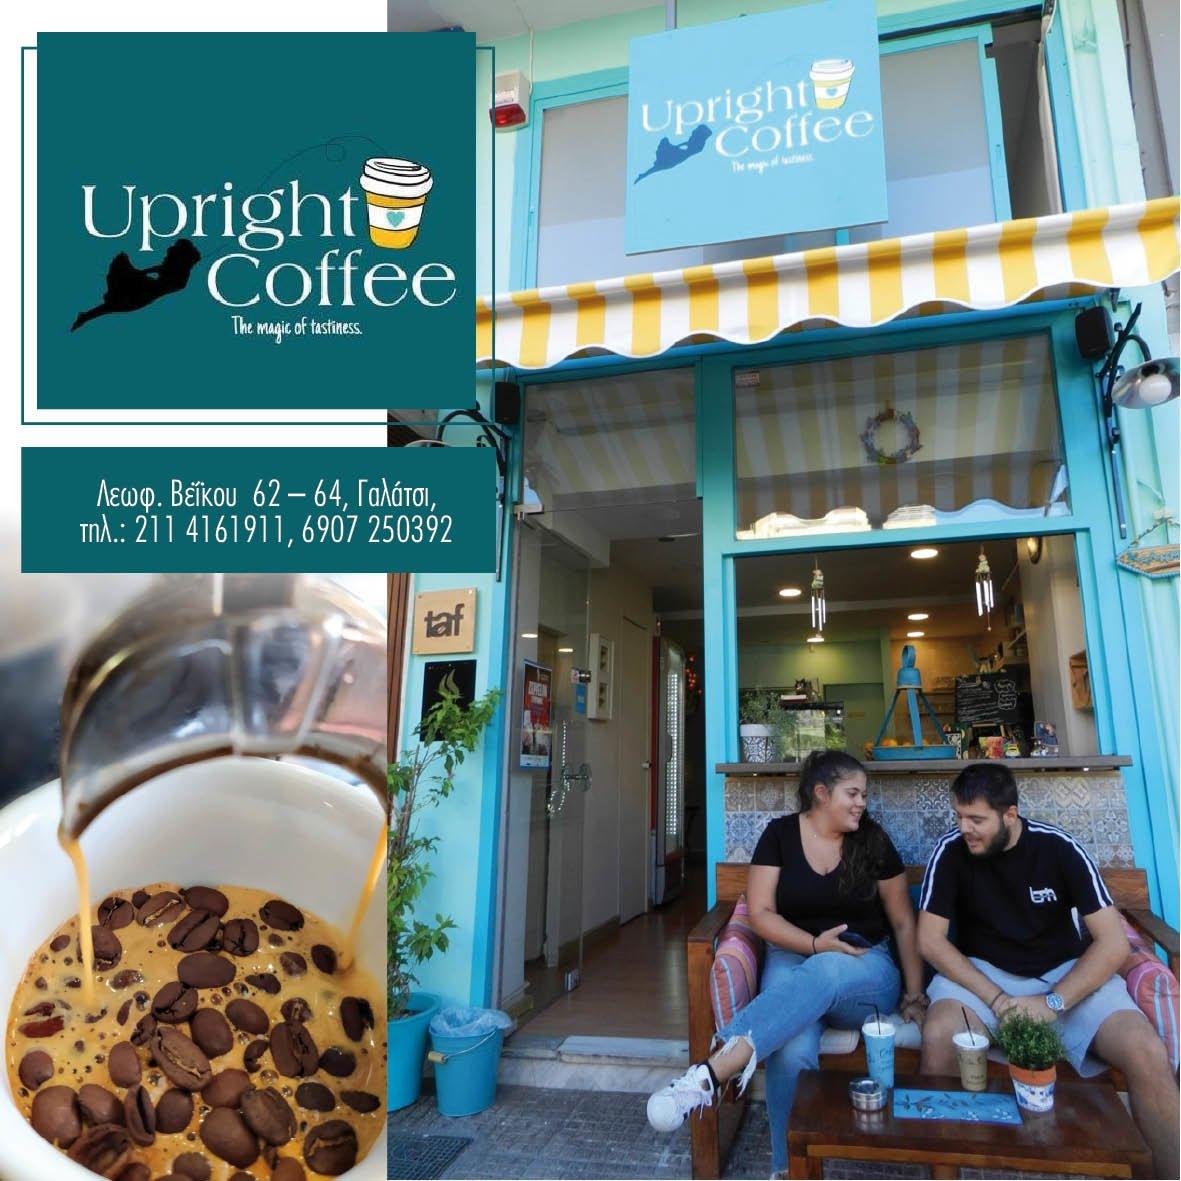 UPRIGHT COFFEE